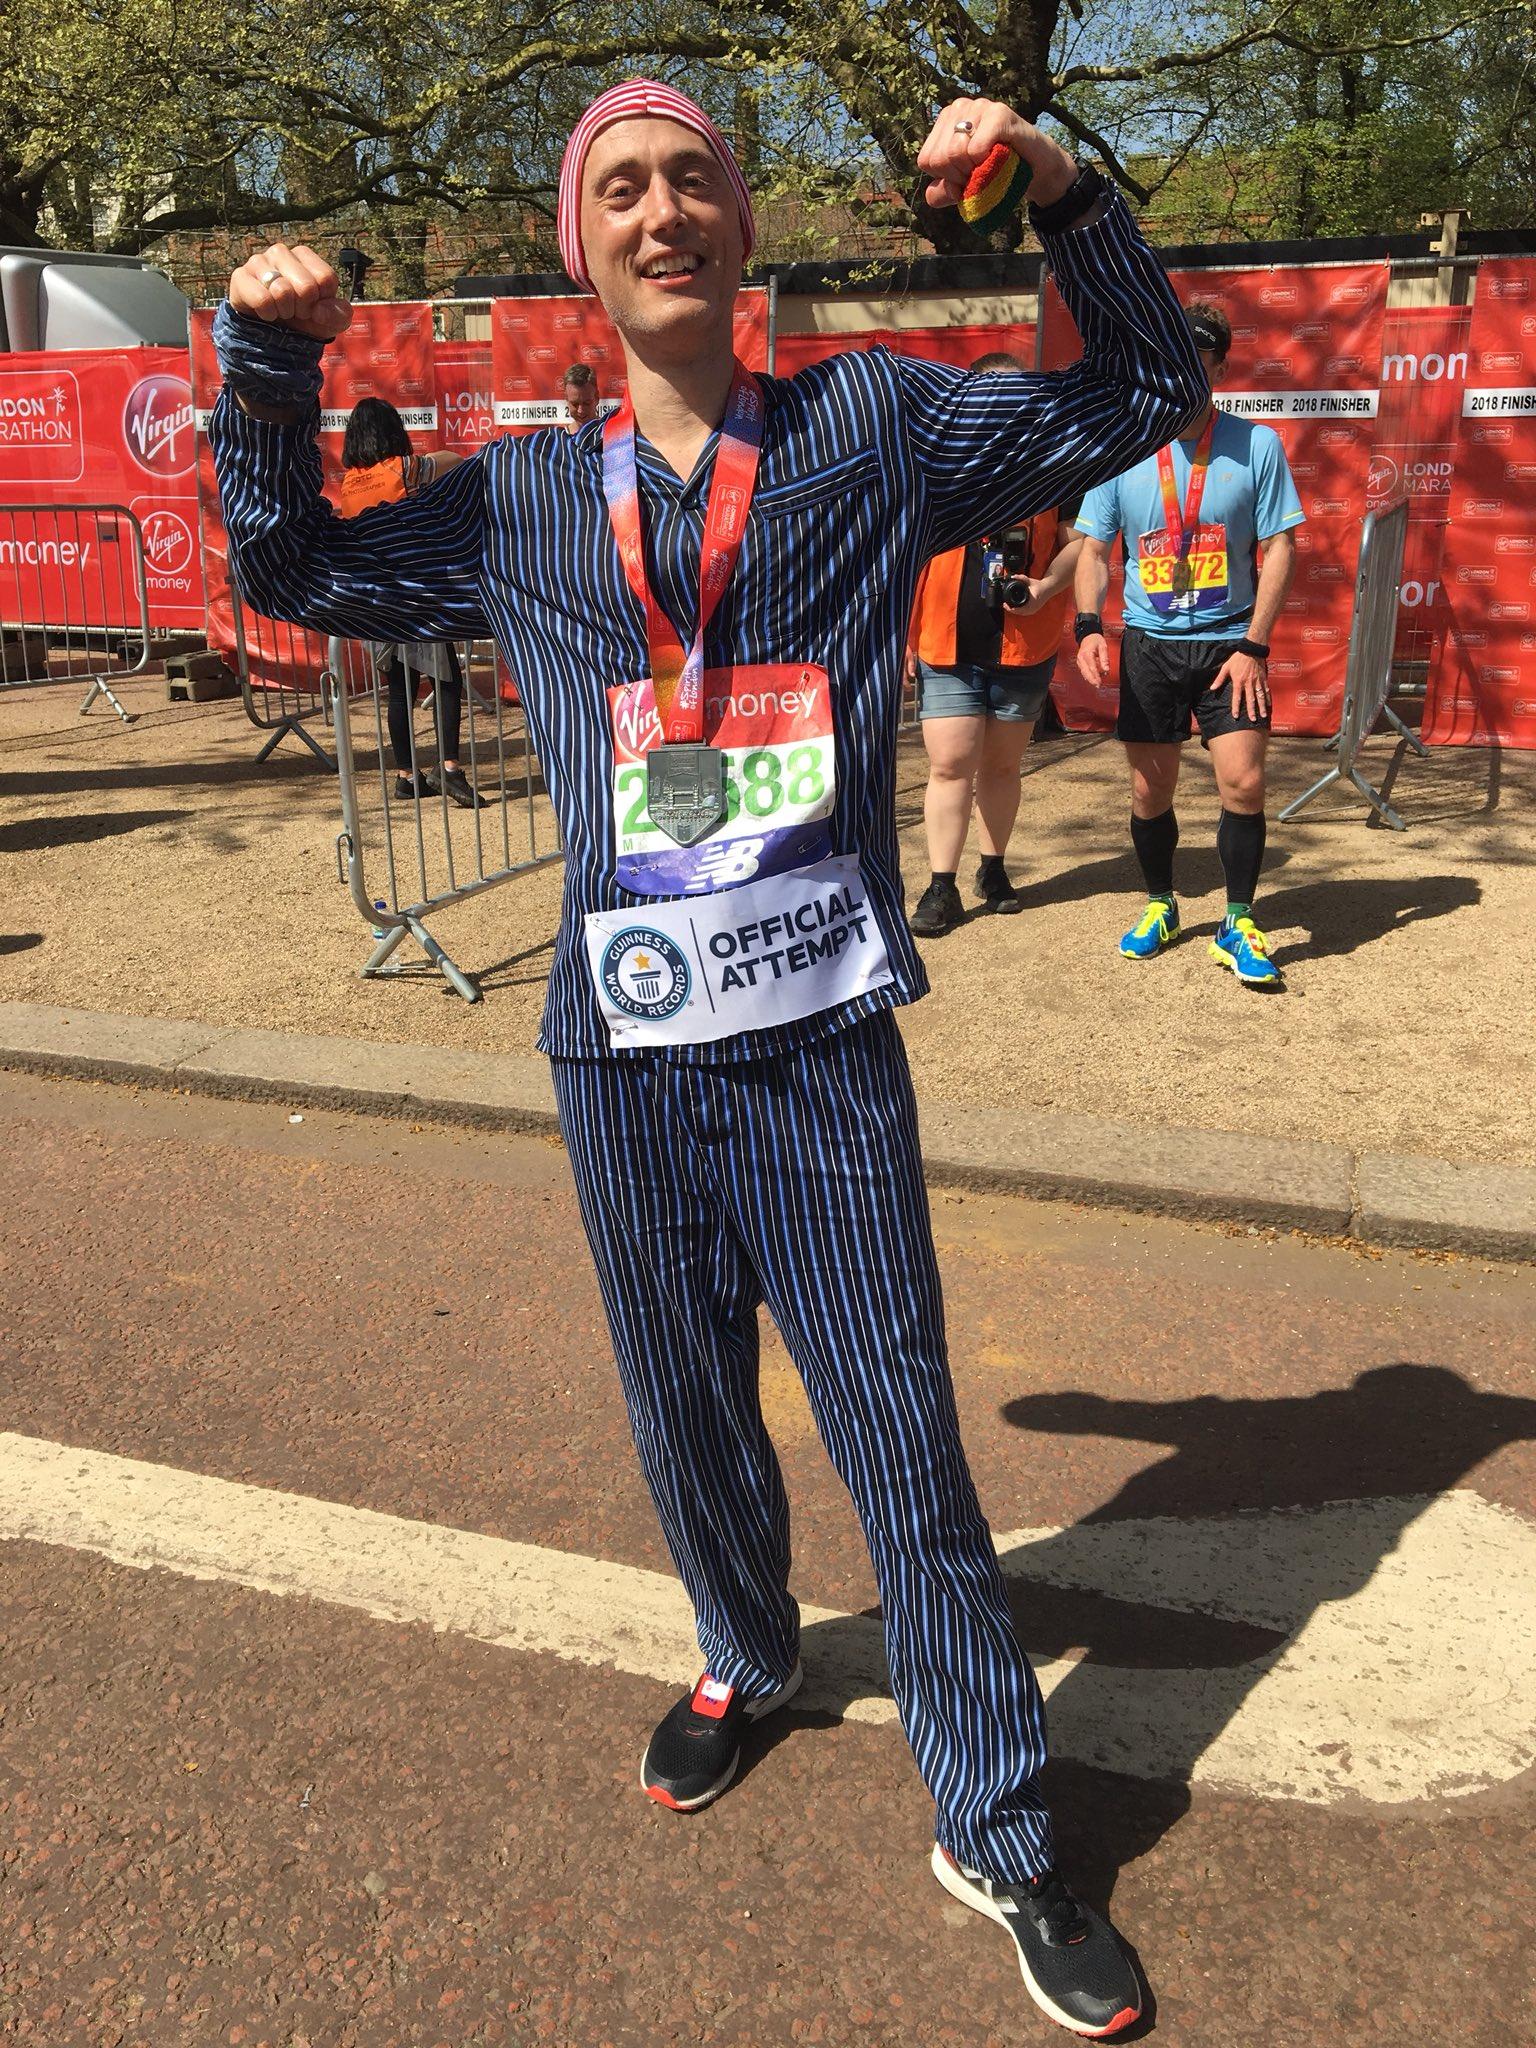 David Stoneman, Fastest marathon dressed in pyjamas (male) 3:07:09